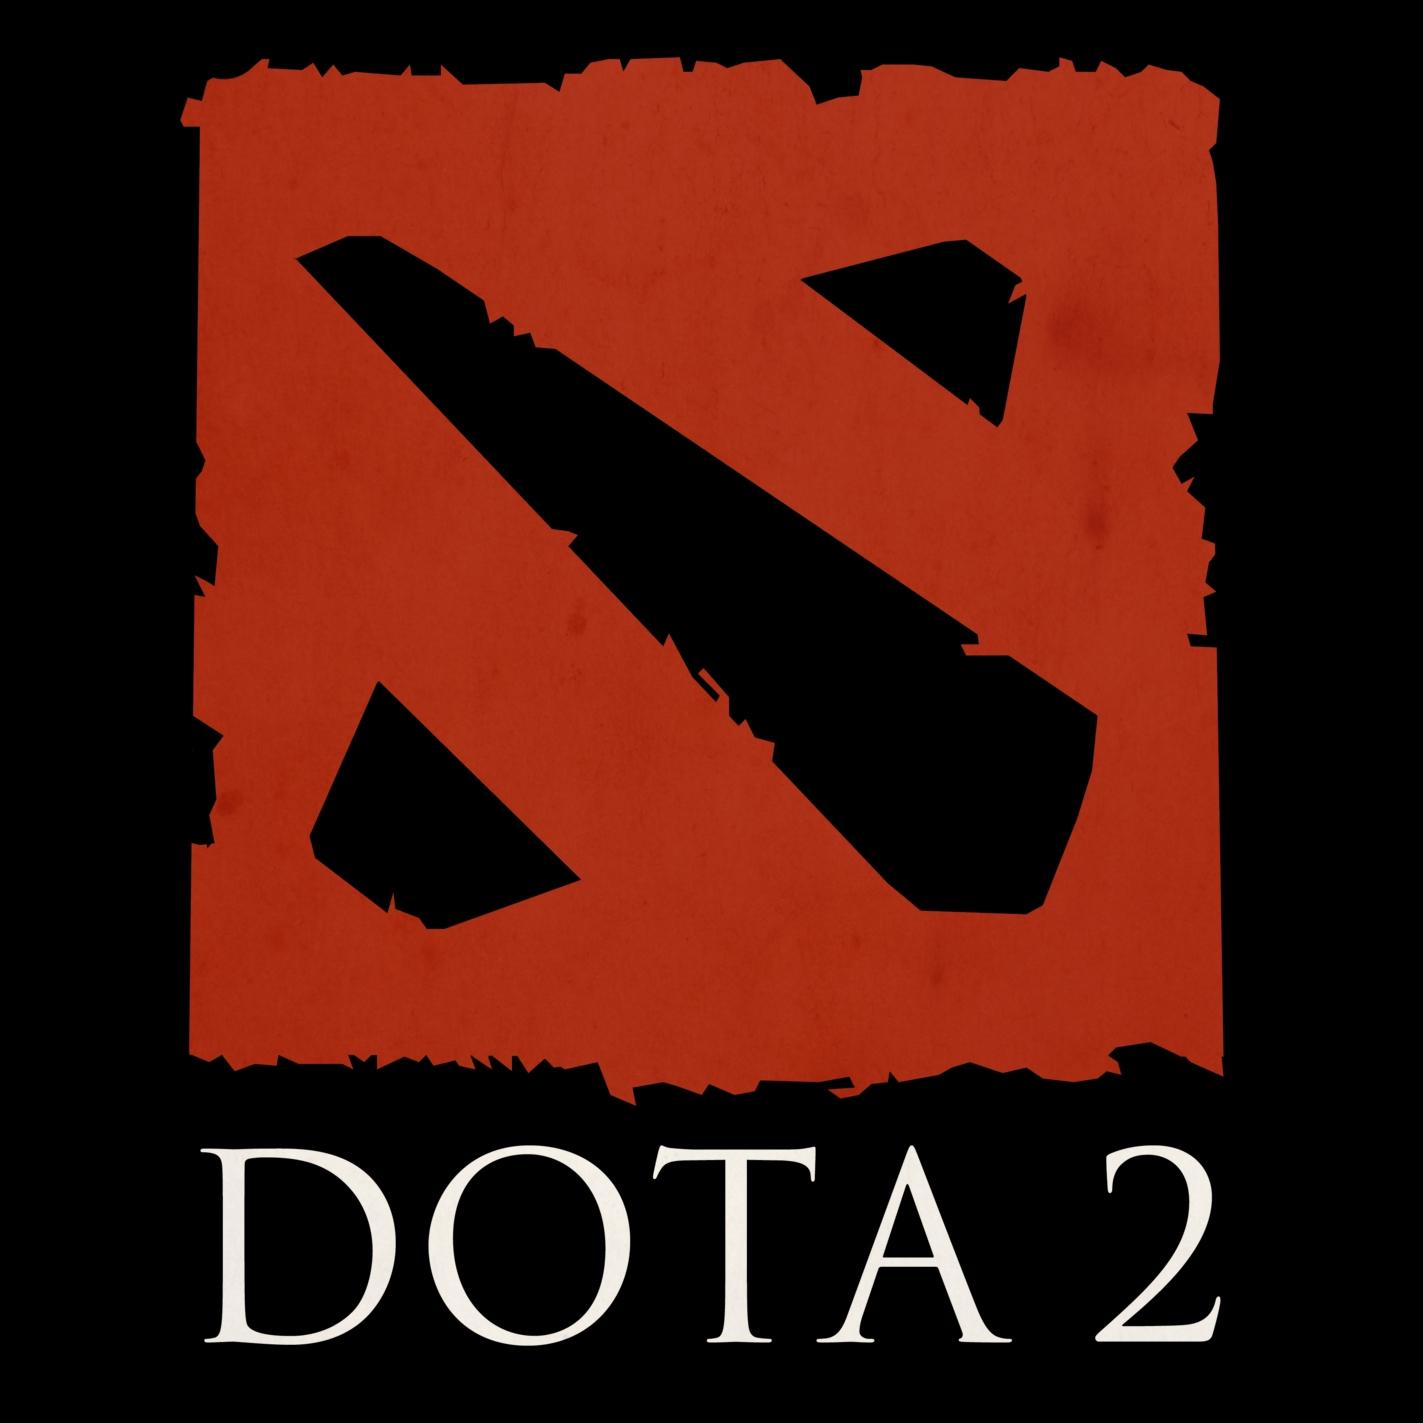 Télécharger Dota 2